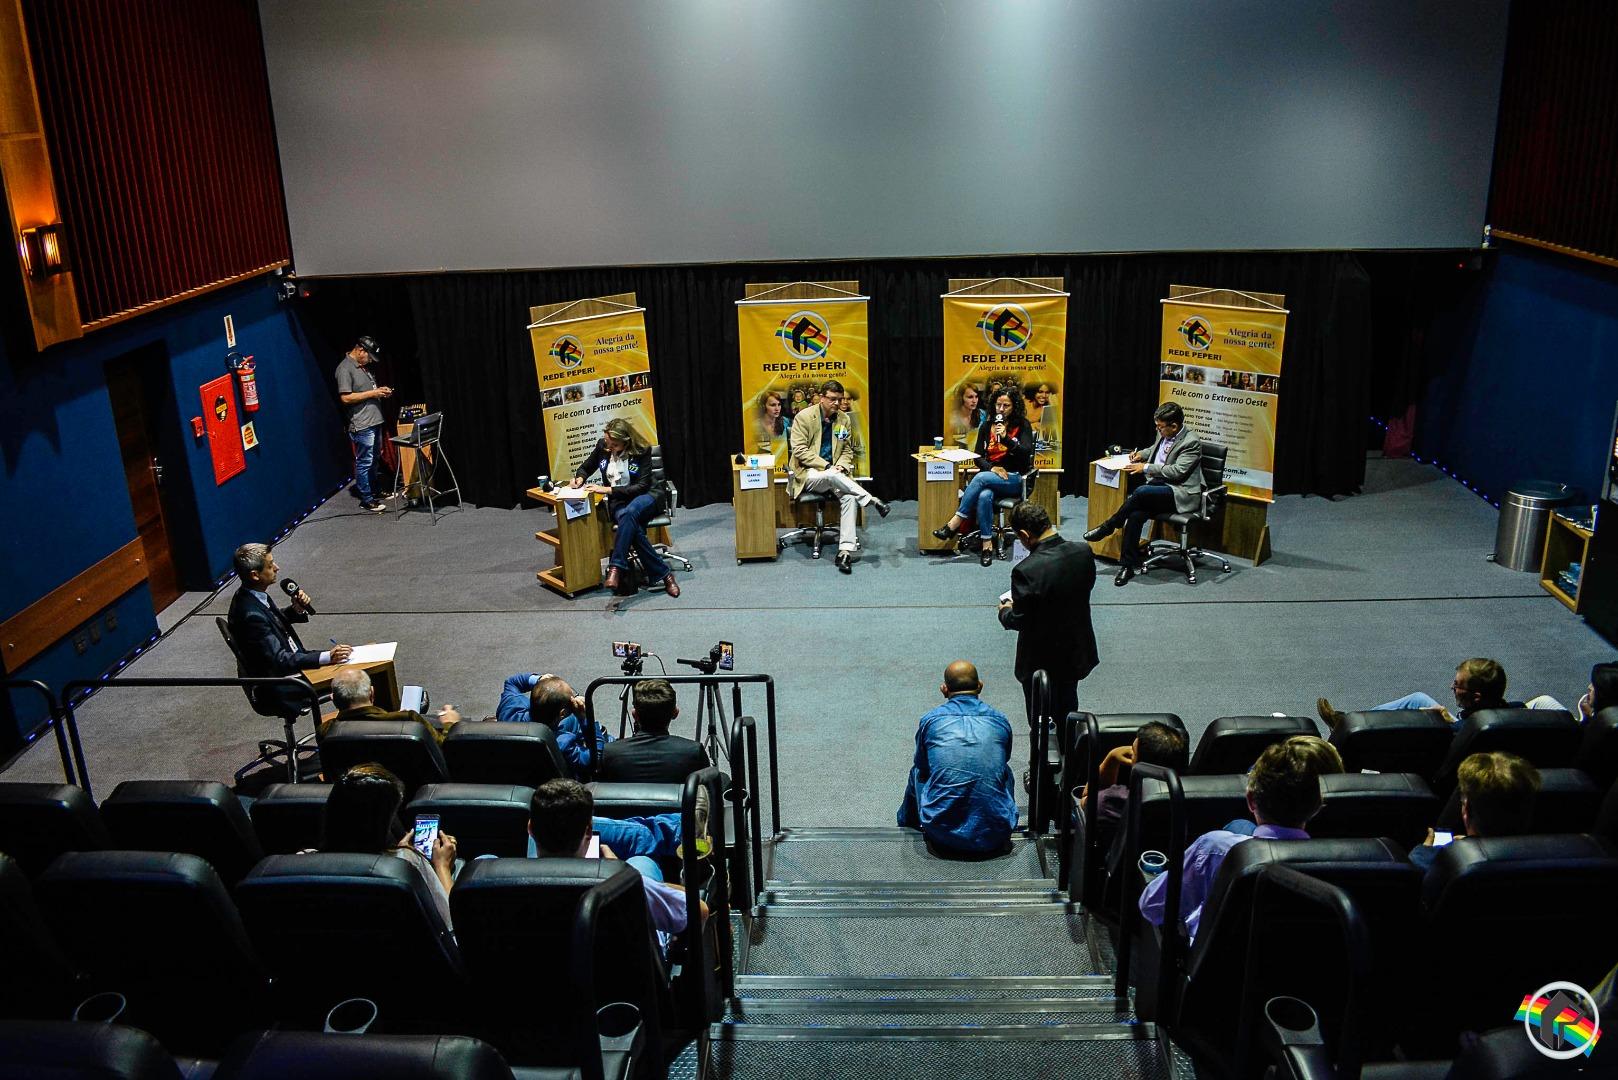 VÍDEO: Quatro candidatos participam de debate para vice-governador